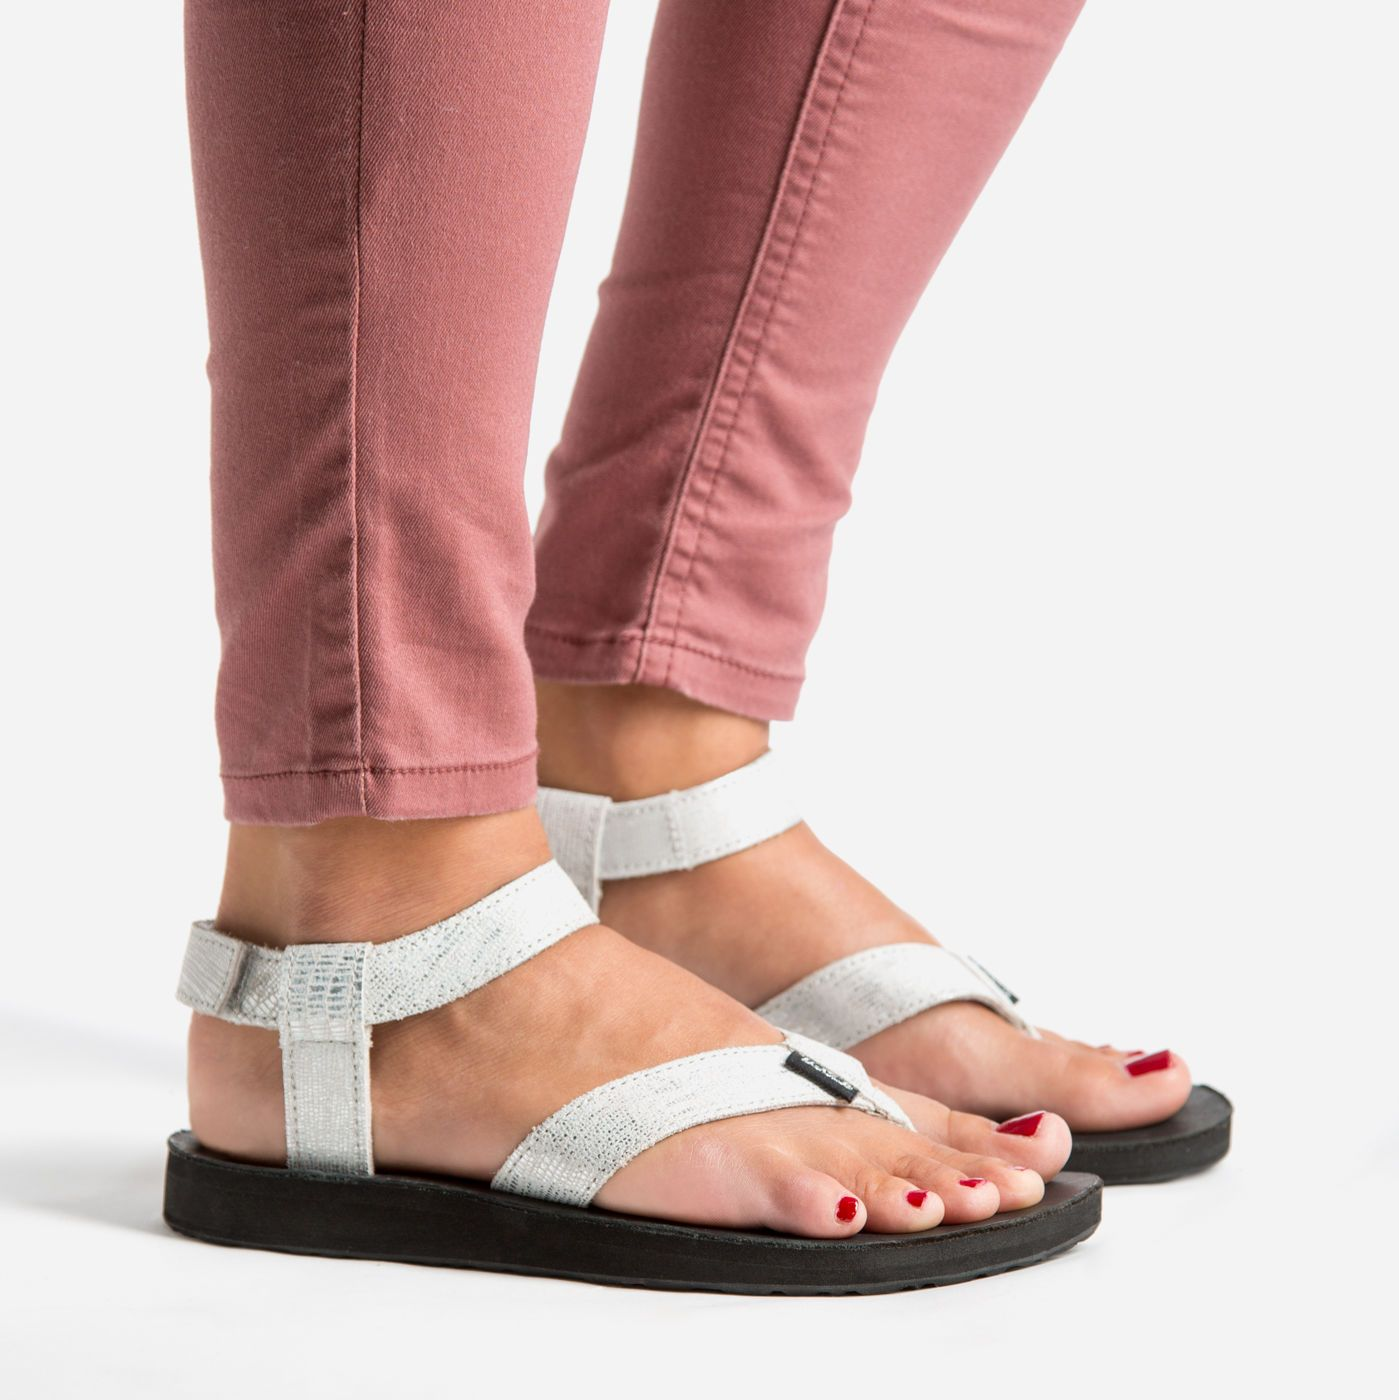 3e3acf82193 Free Shipping & Free Returns on Authentic Teva® Women's Sandals ...